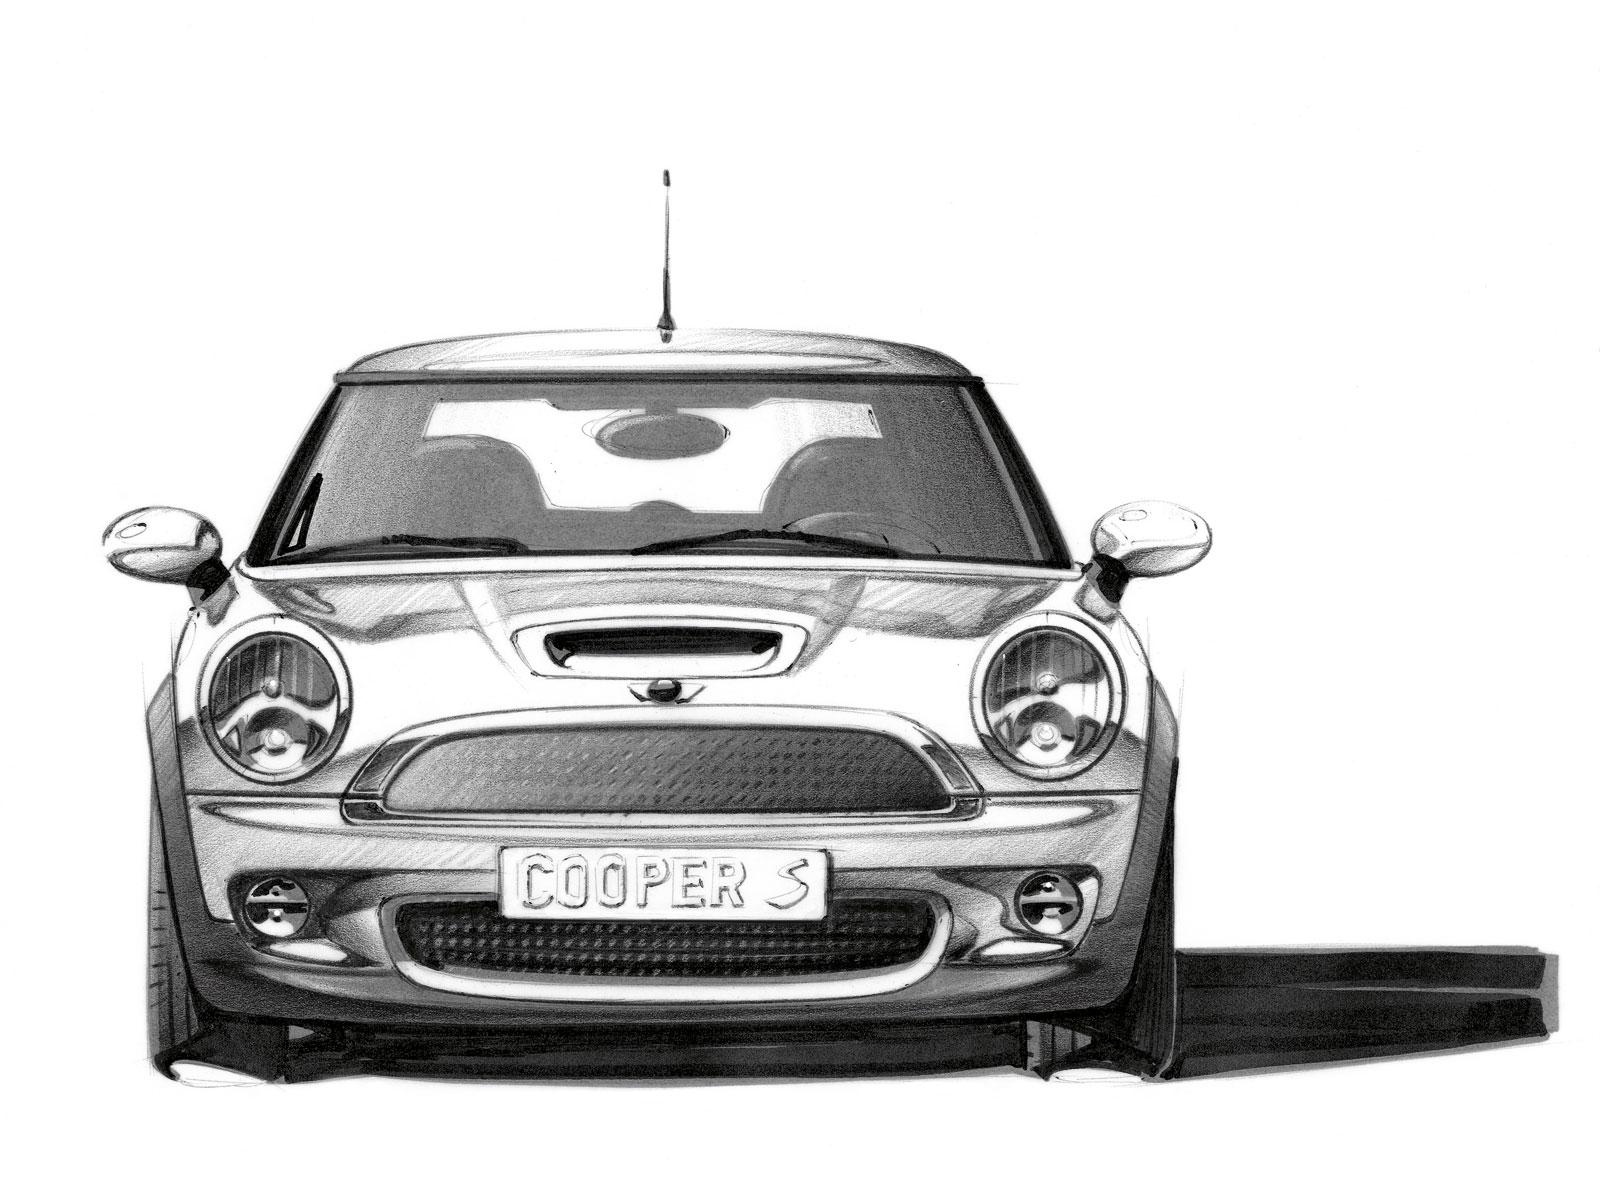 Basic design of a car - Mini Design Sketch Car Body Design 57767 On Wookmark